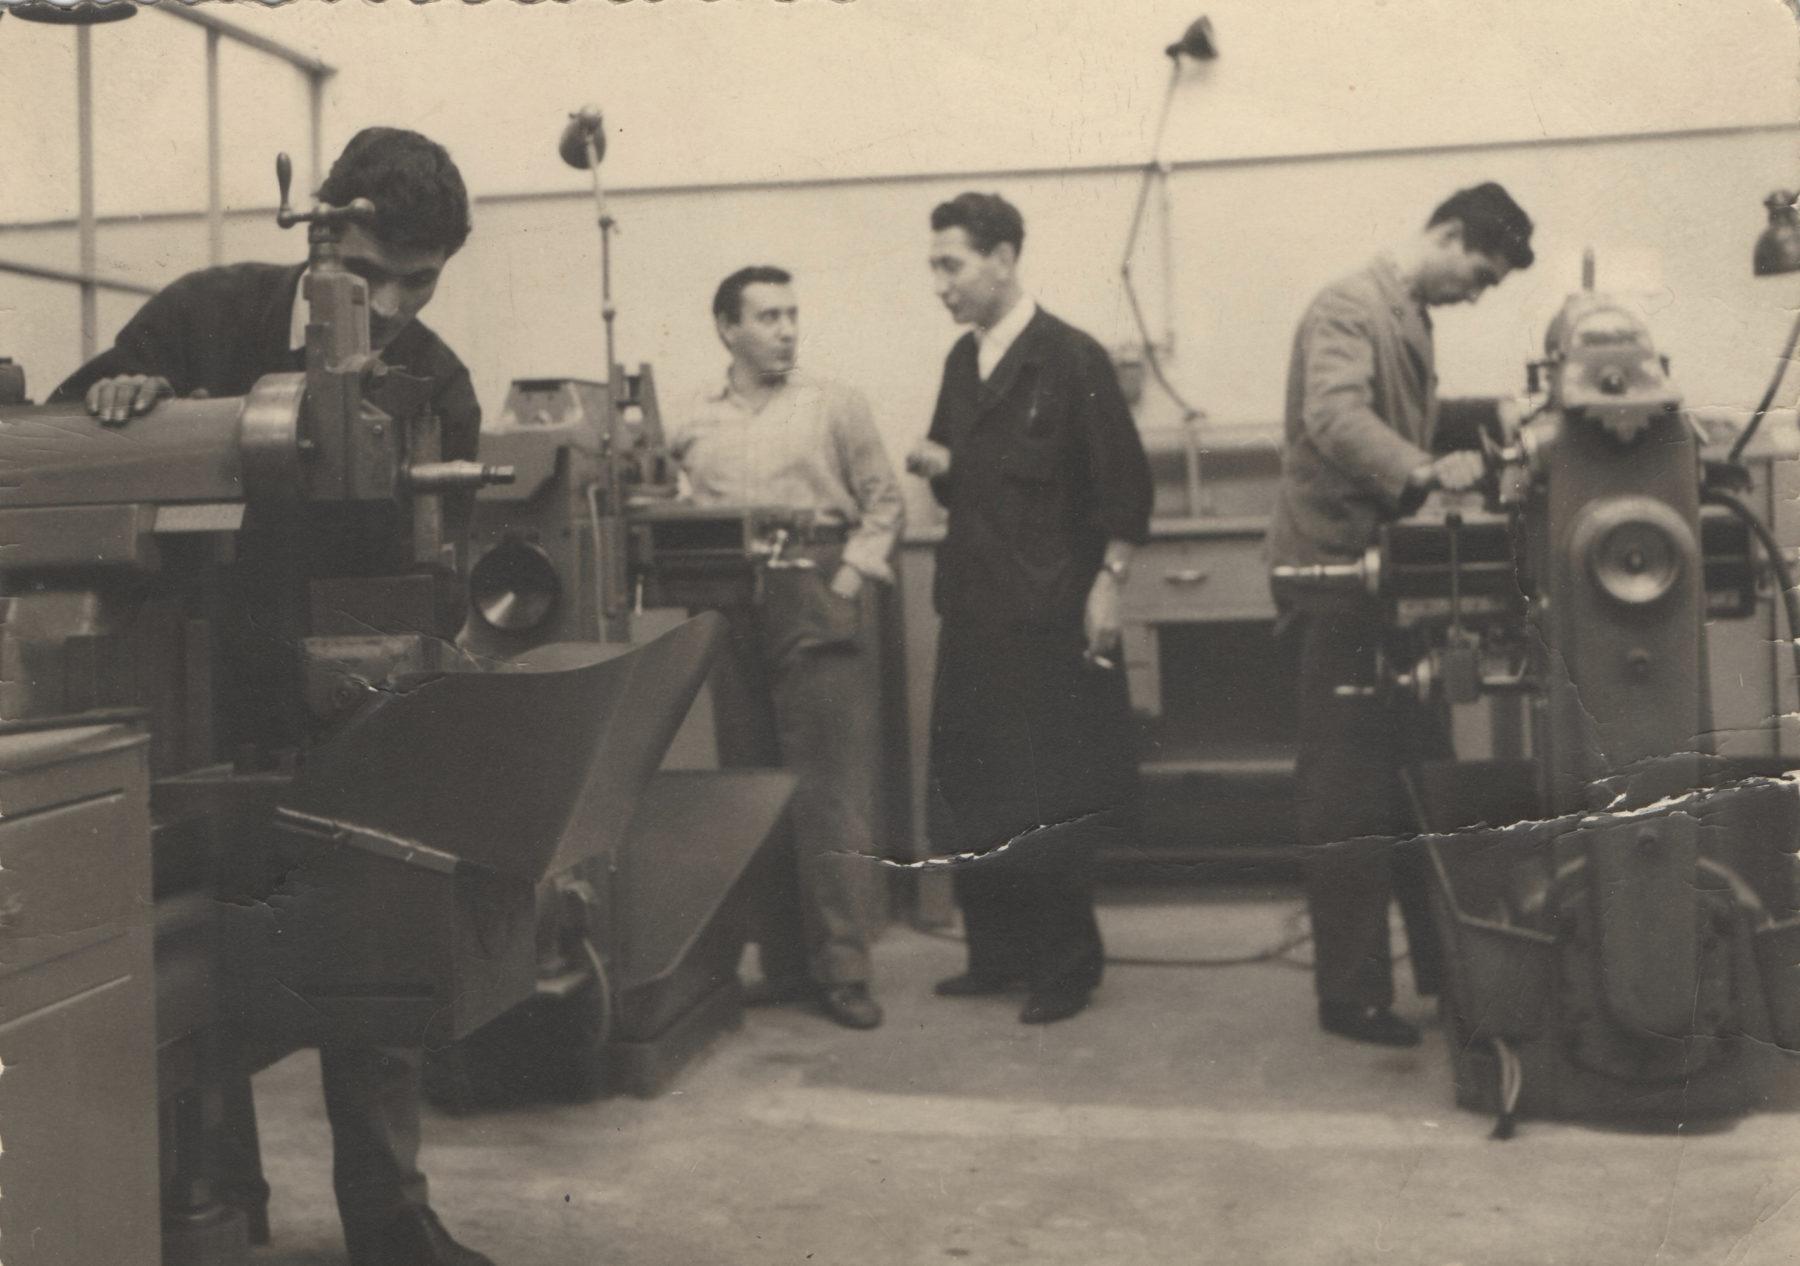 film from the attic lamprom milano 2